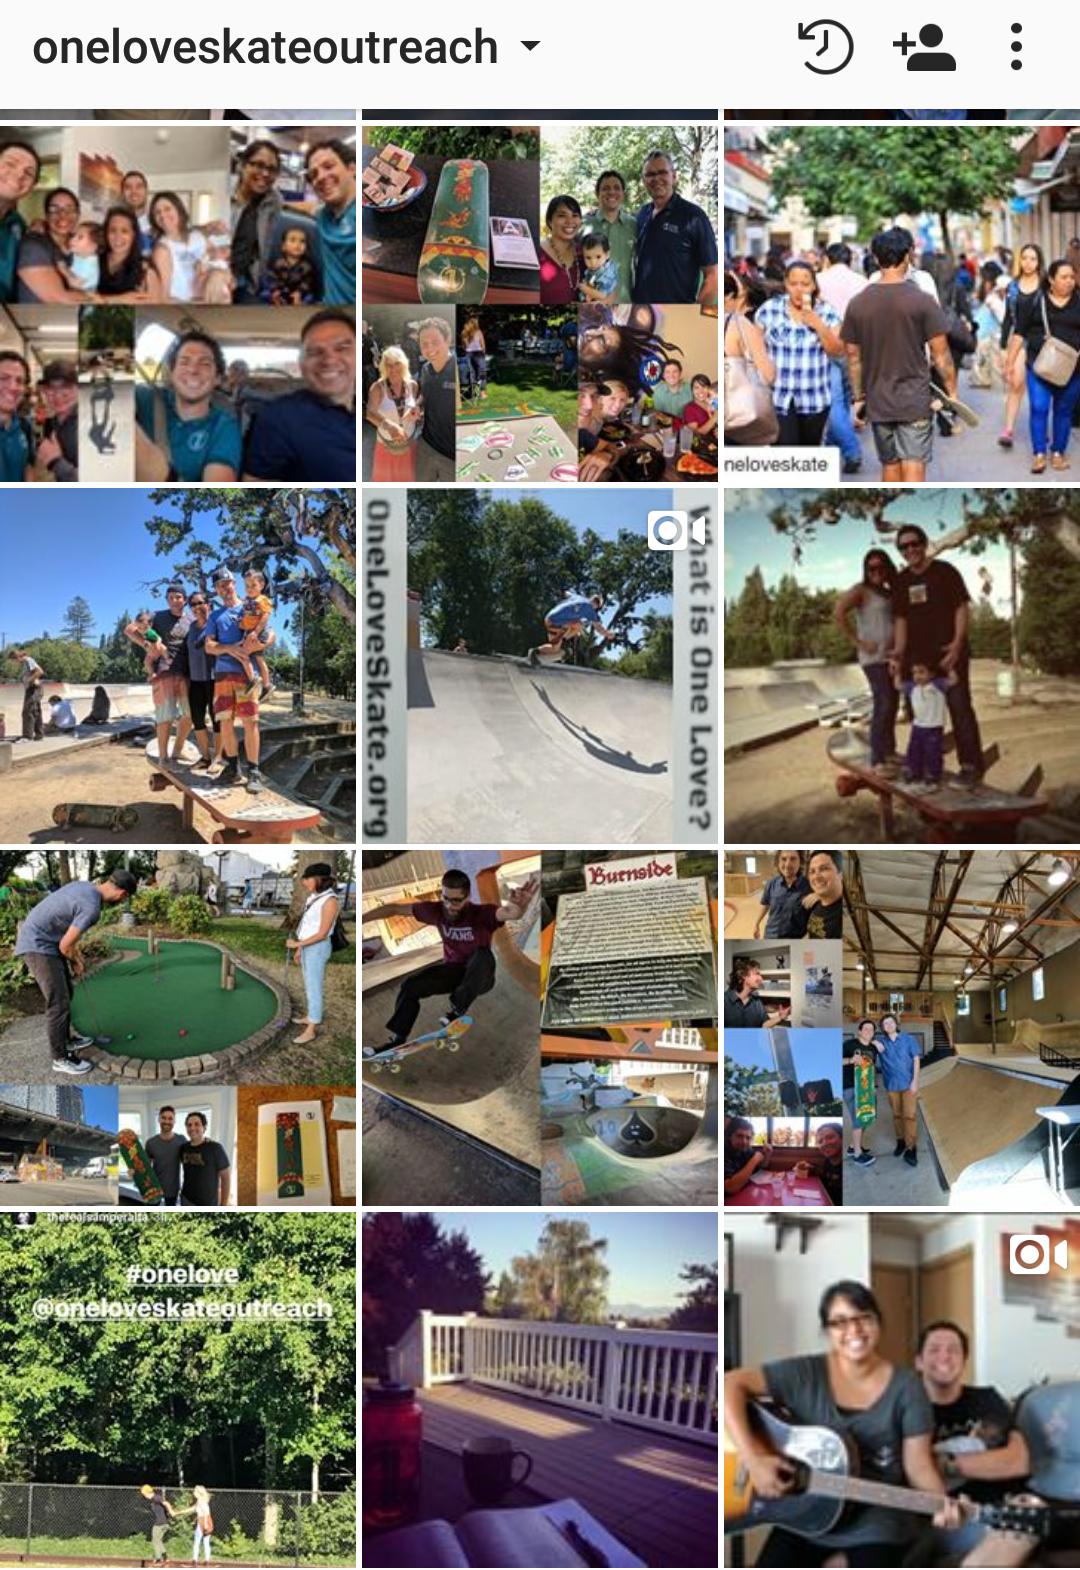 Recent  https://www.instagram.com/oneloveskateoutreach/  posts - It's been a very busy week